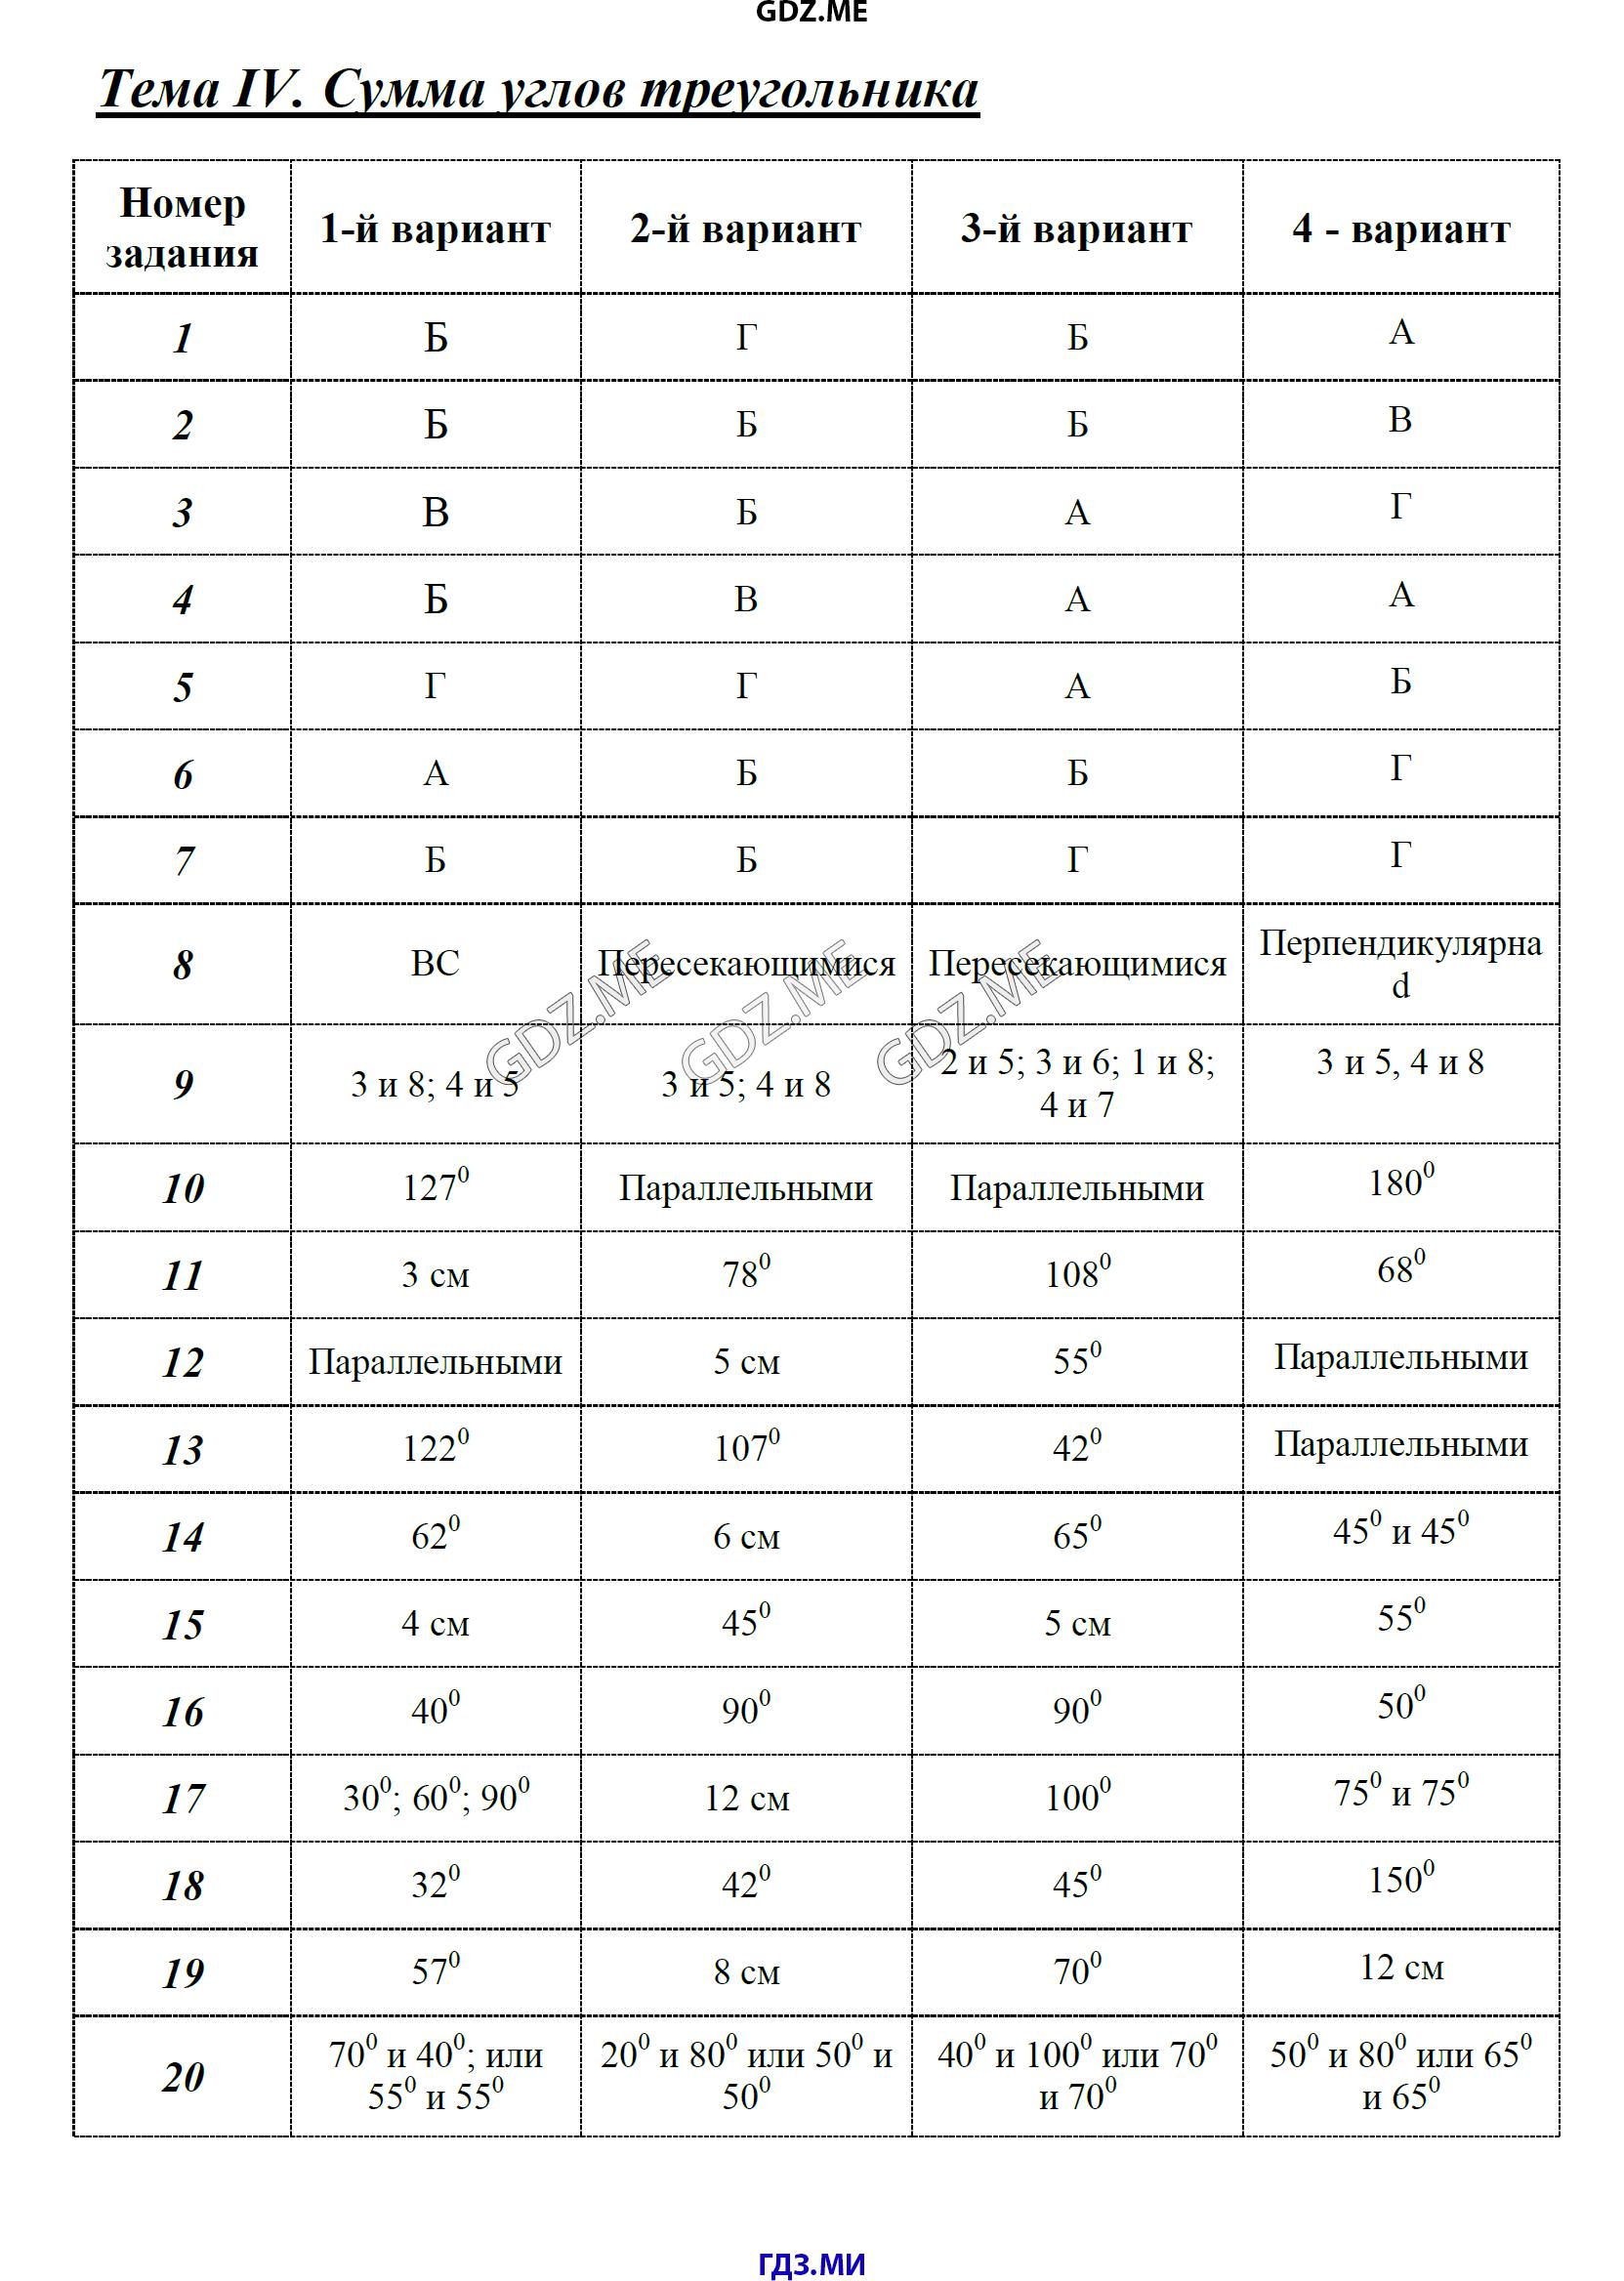 гдз по геометрии тесты 7 класс фарков